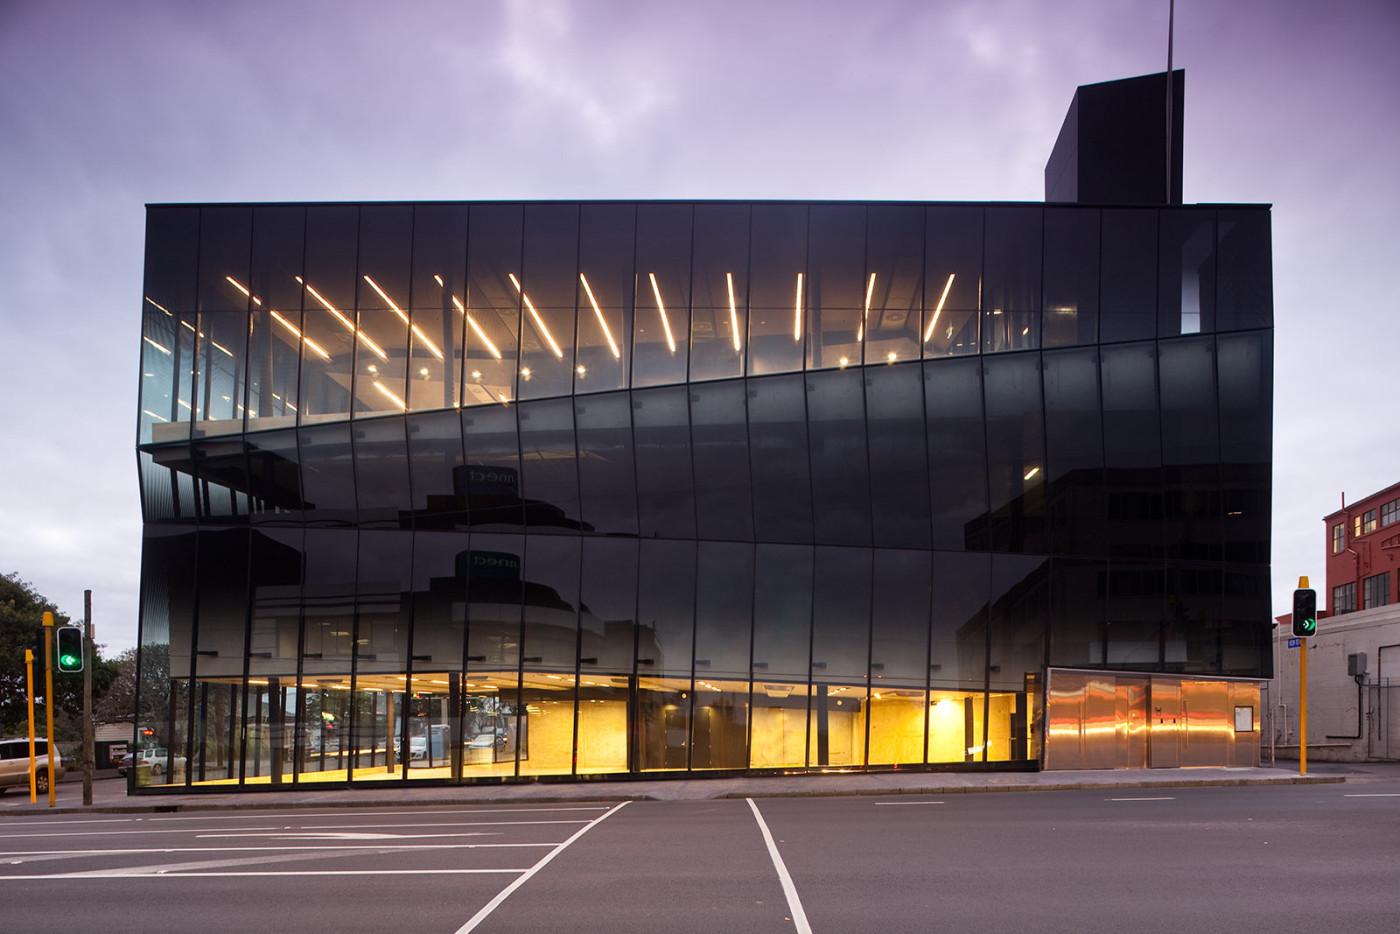 Commercial office building, Anvil, Mt Eden, Auckland, New Zealand.